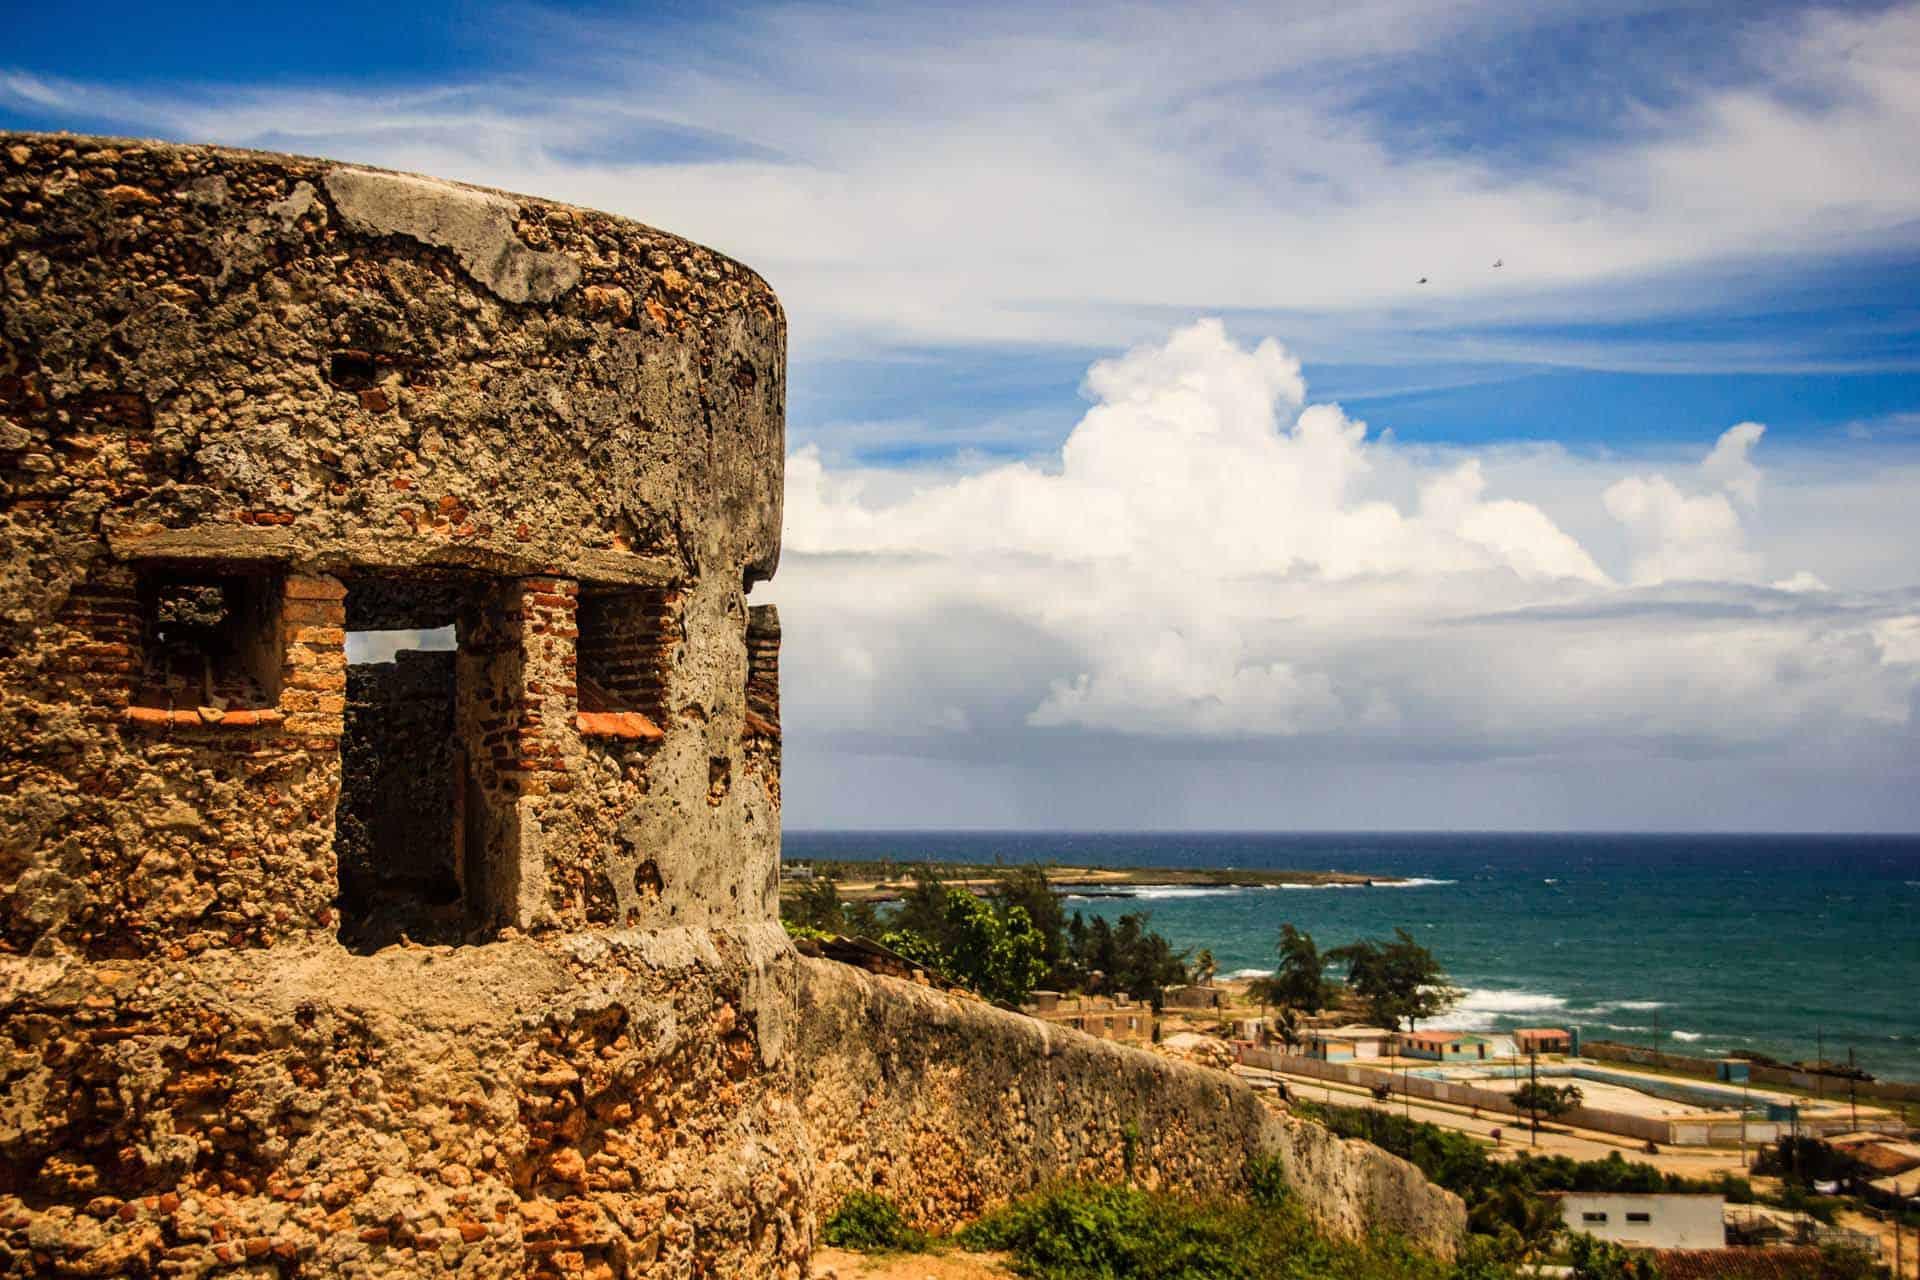 gibara ancienne forteresse de la baie de gibara cuba autrement